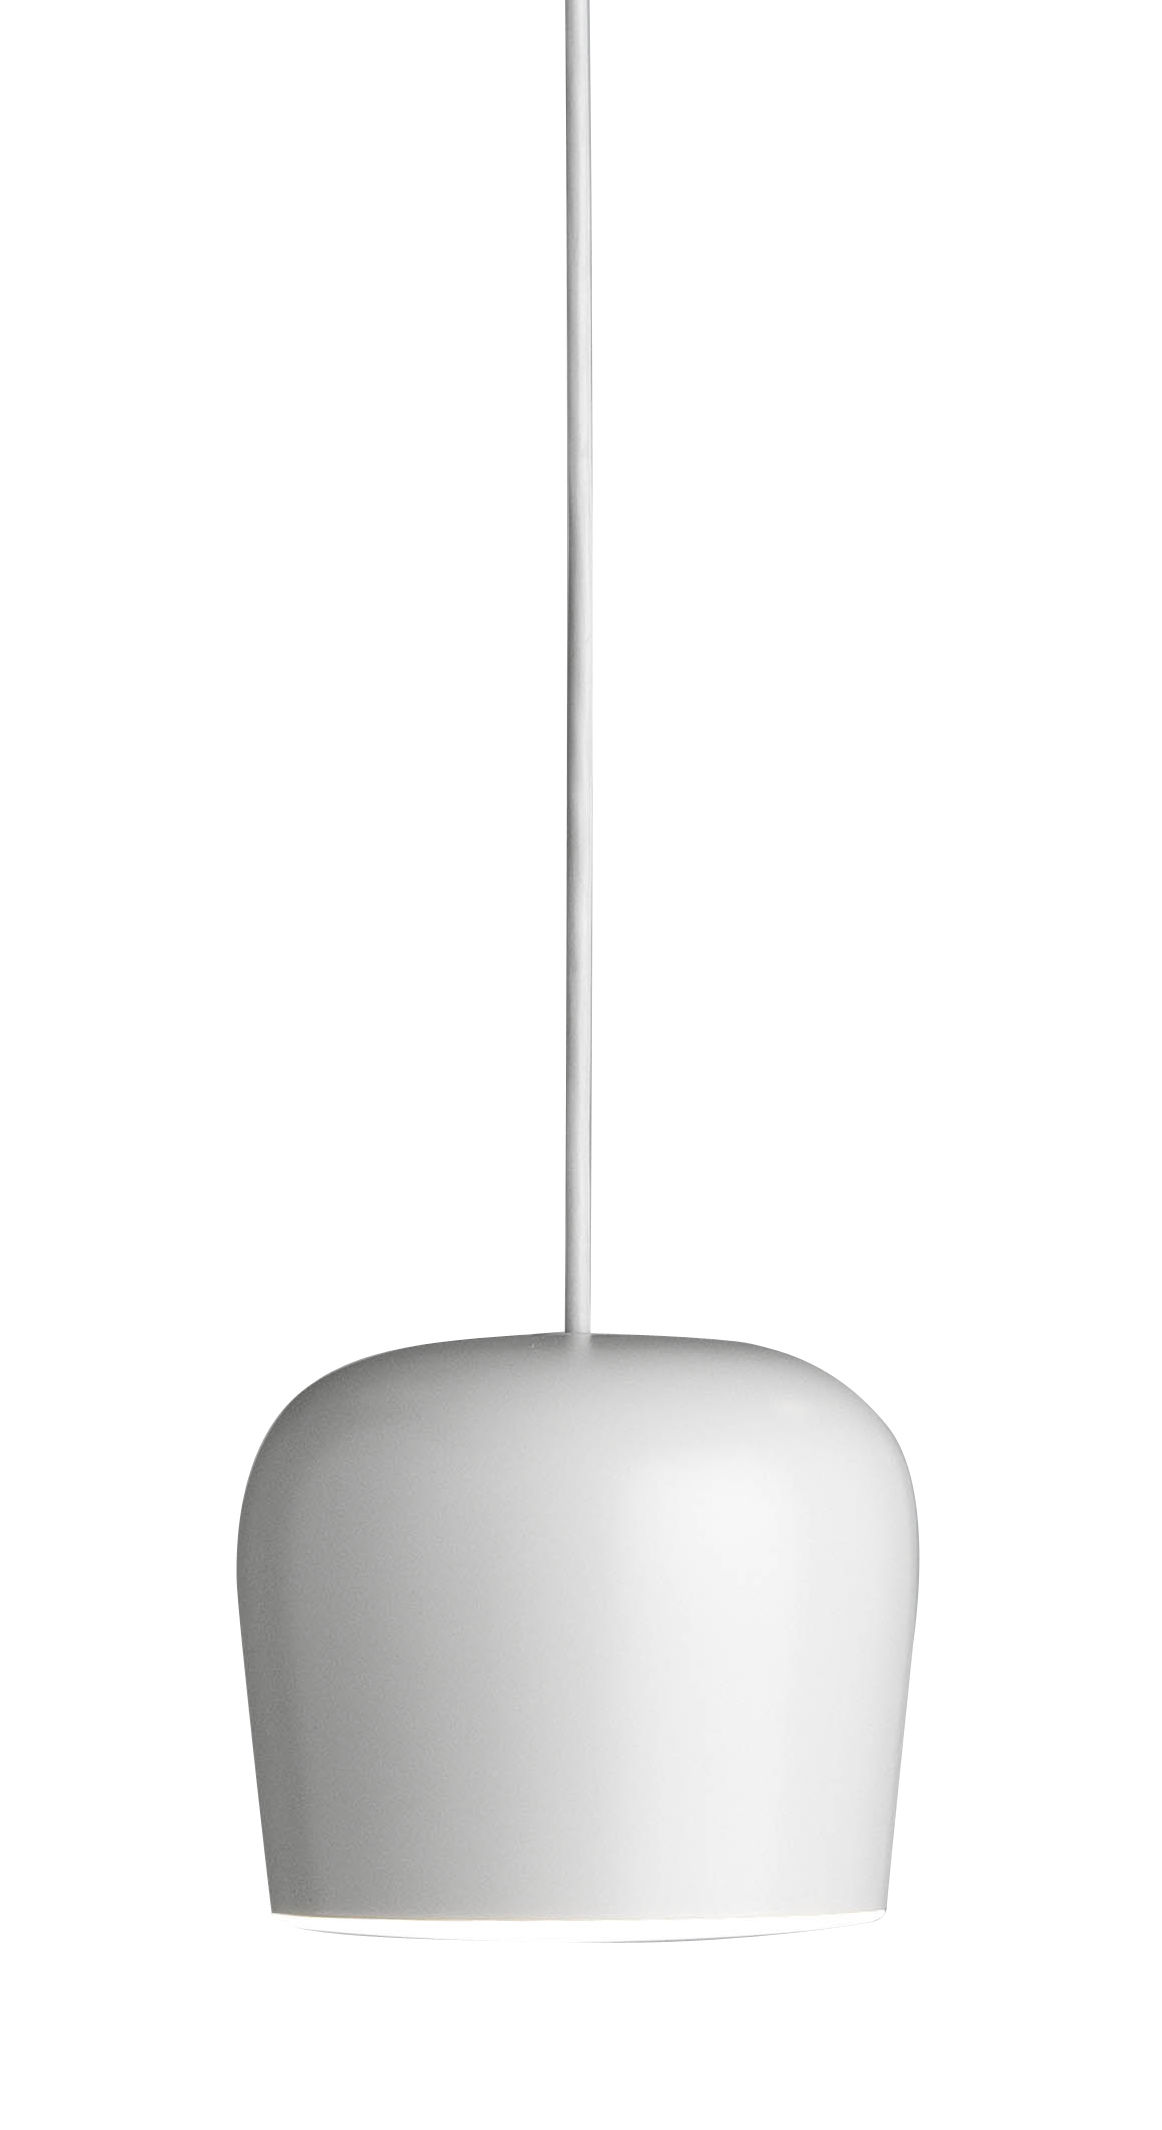 Lighting - Pendant Lighting - AIM Small Fix Pendant - LED - Ø 17 cm by Flos - White - Aluminium, Polycarbonate